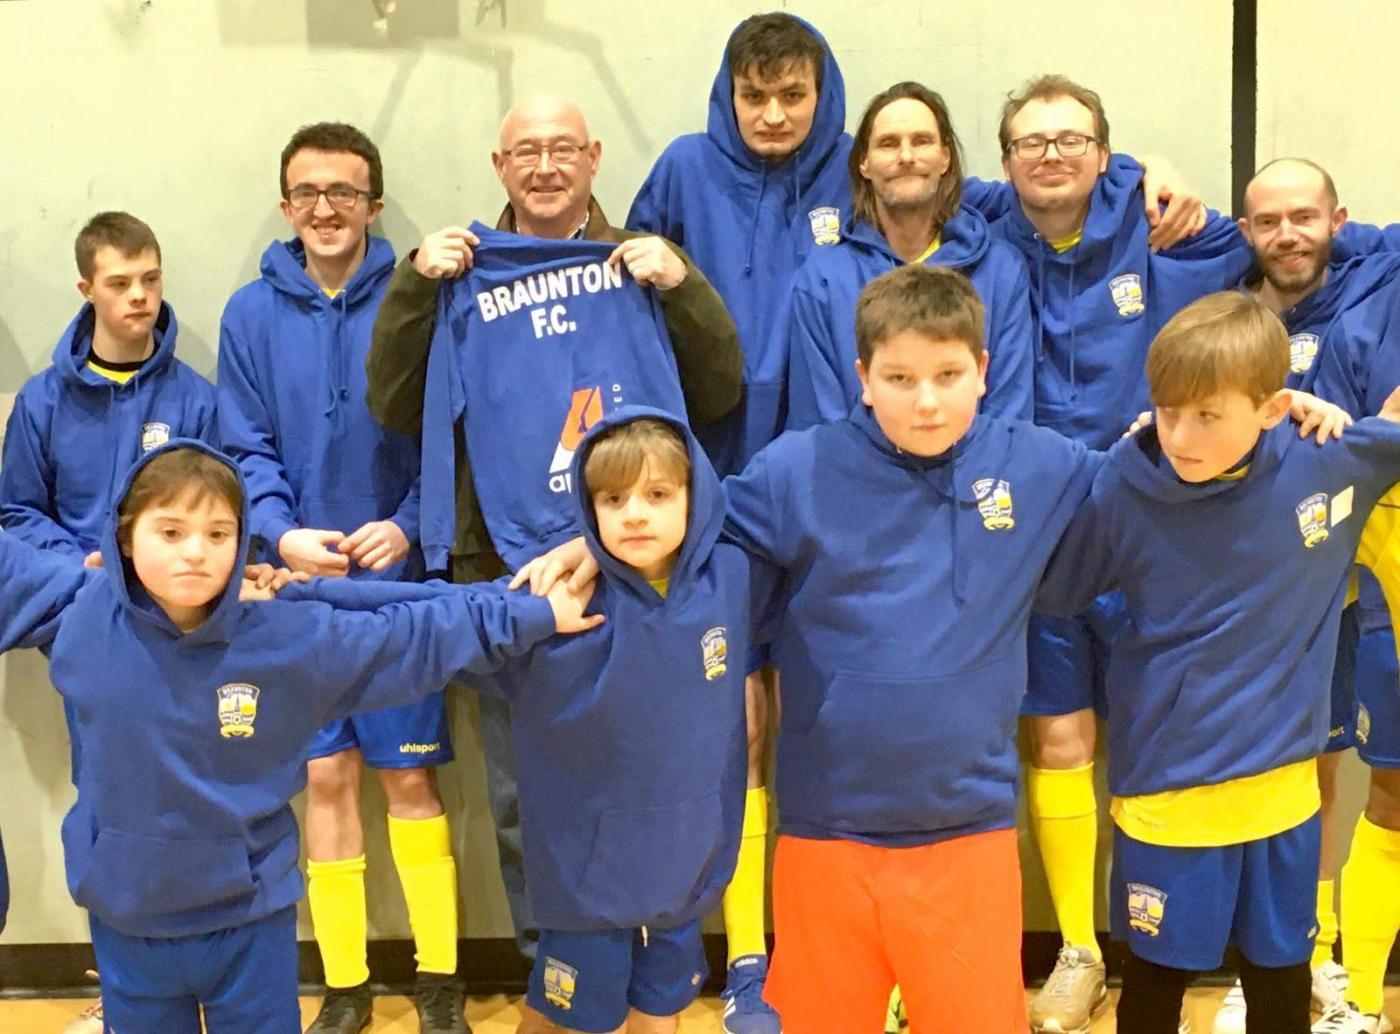 Braunton Football Ability with their hoodies